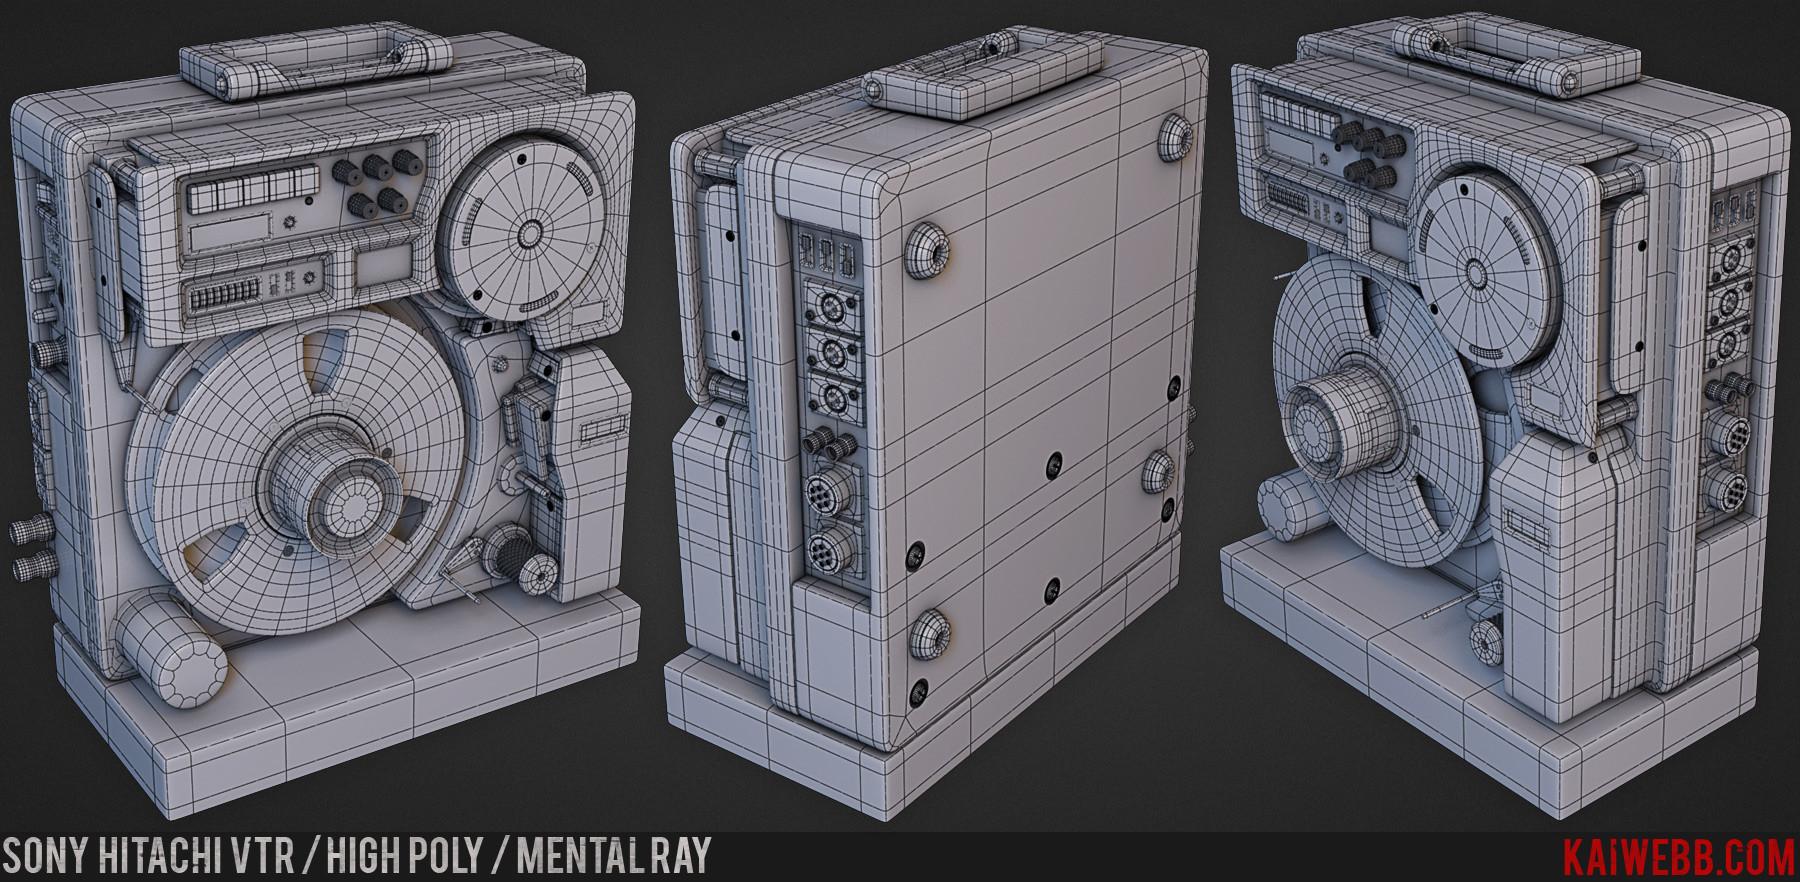 ArtStation - Kai Webb | Sony Hitachi VTR, Media Arts and Animation